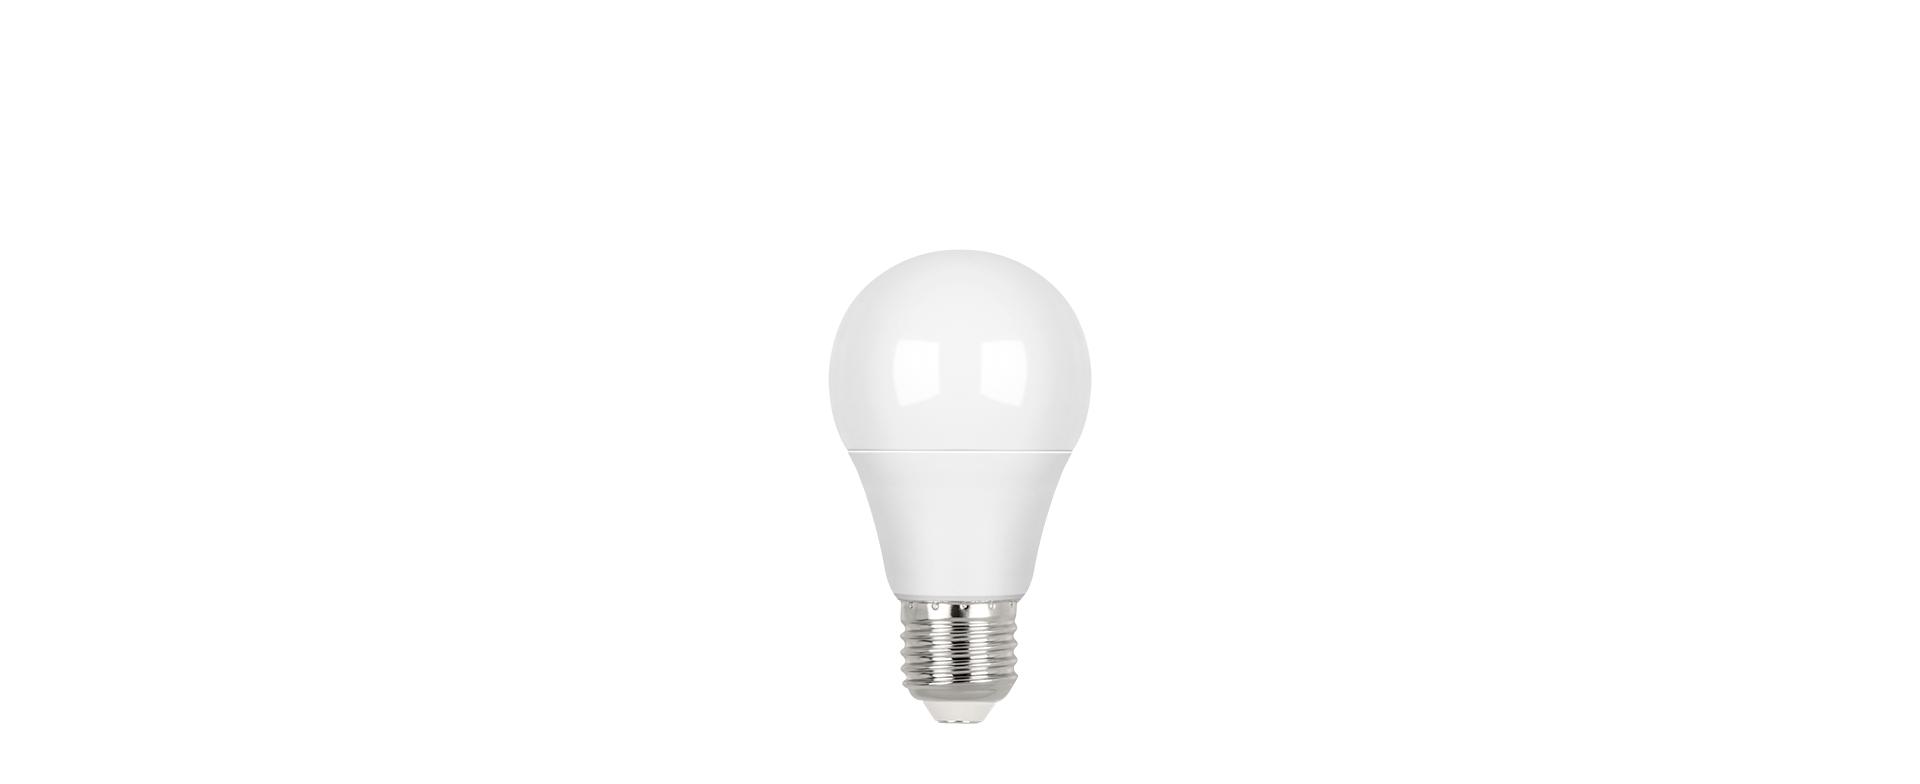 LÂMPADA LED BULBO 9W 6500K BRANCO FRIO 806lm  STH8265/65- STELLA